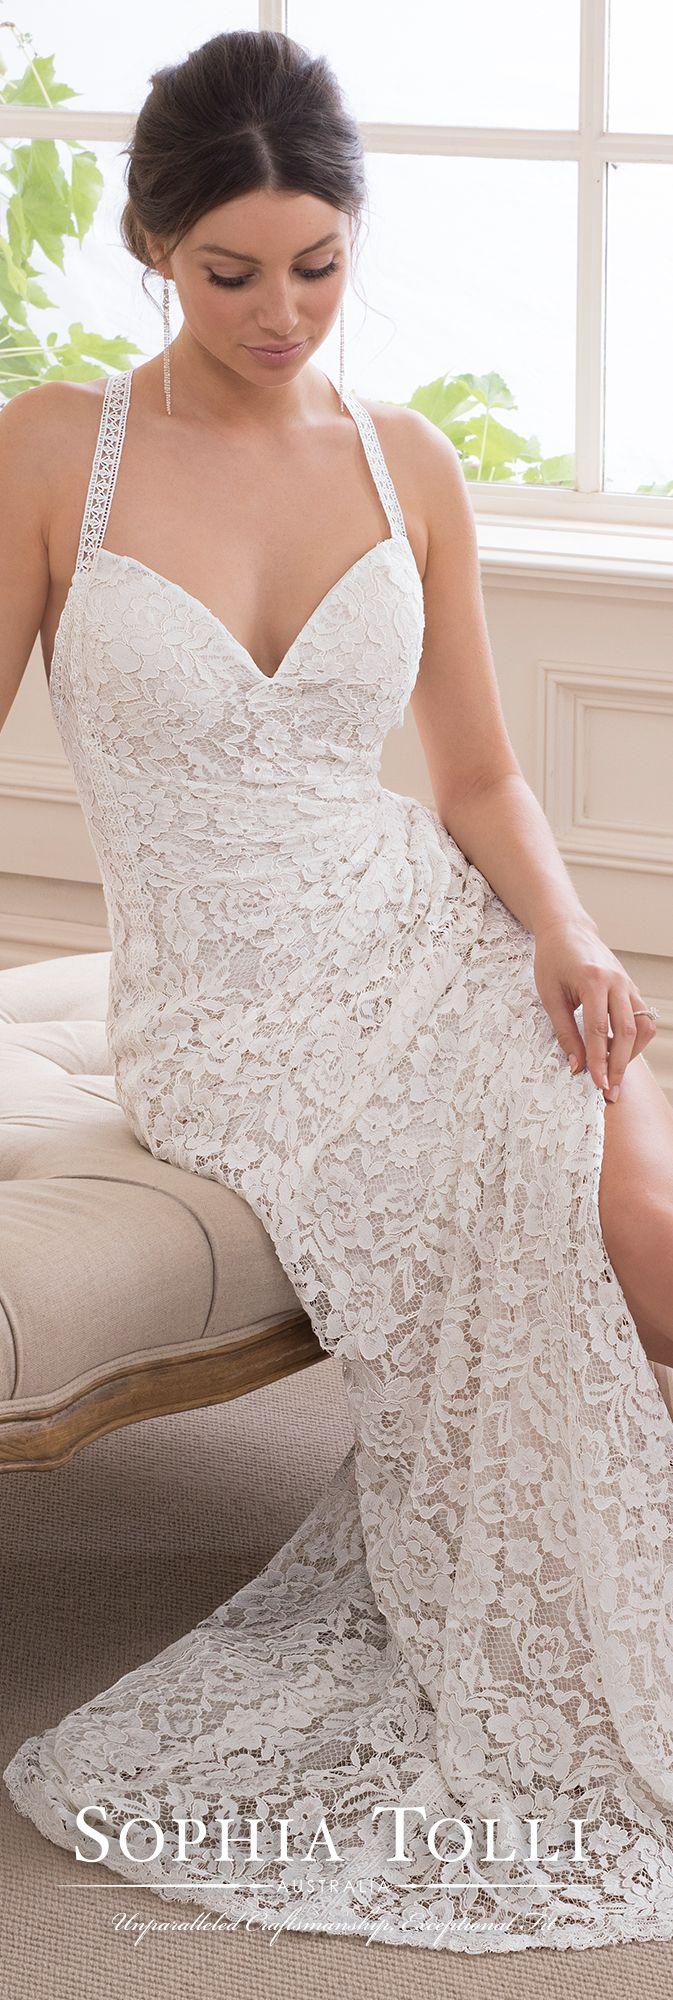 Boho chic allover lace sheath halter wedding gown wedding ideas